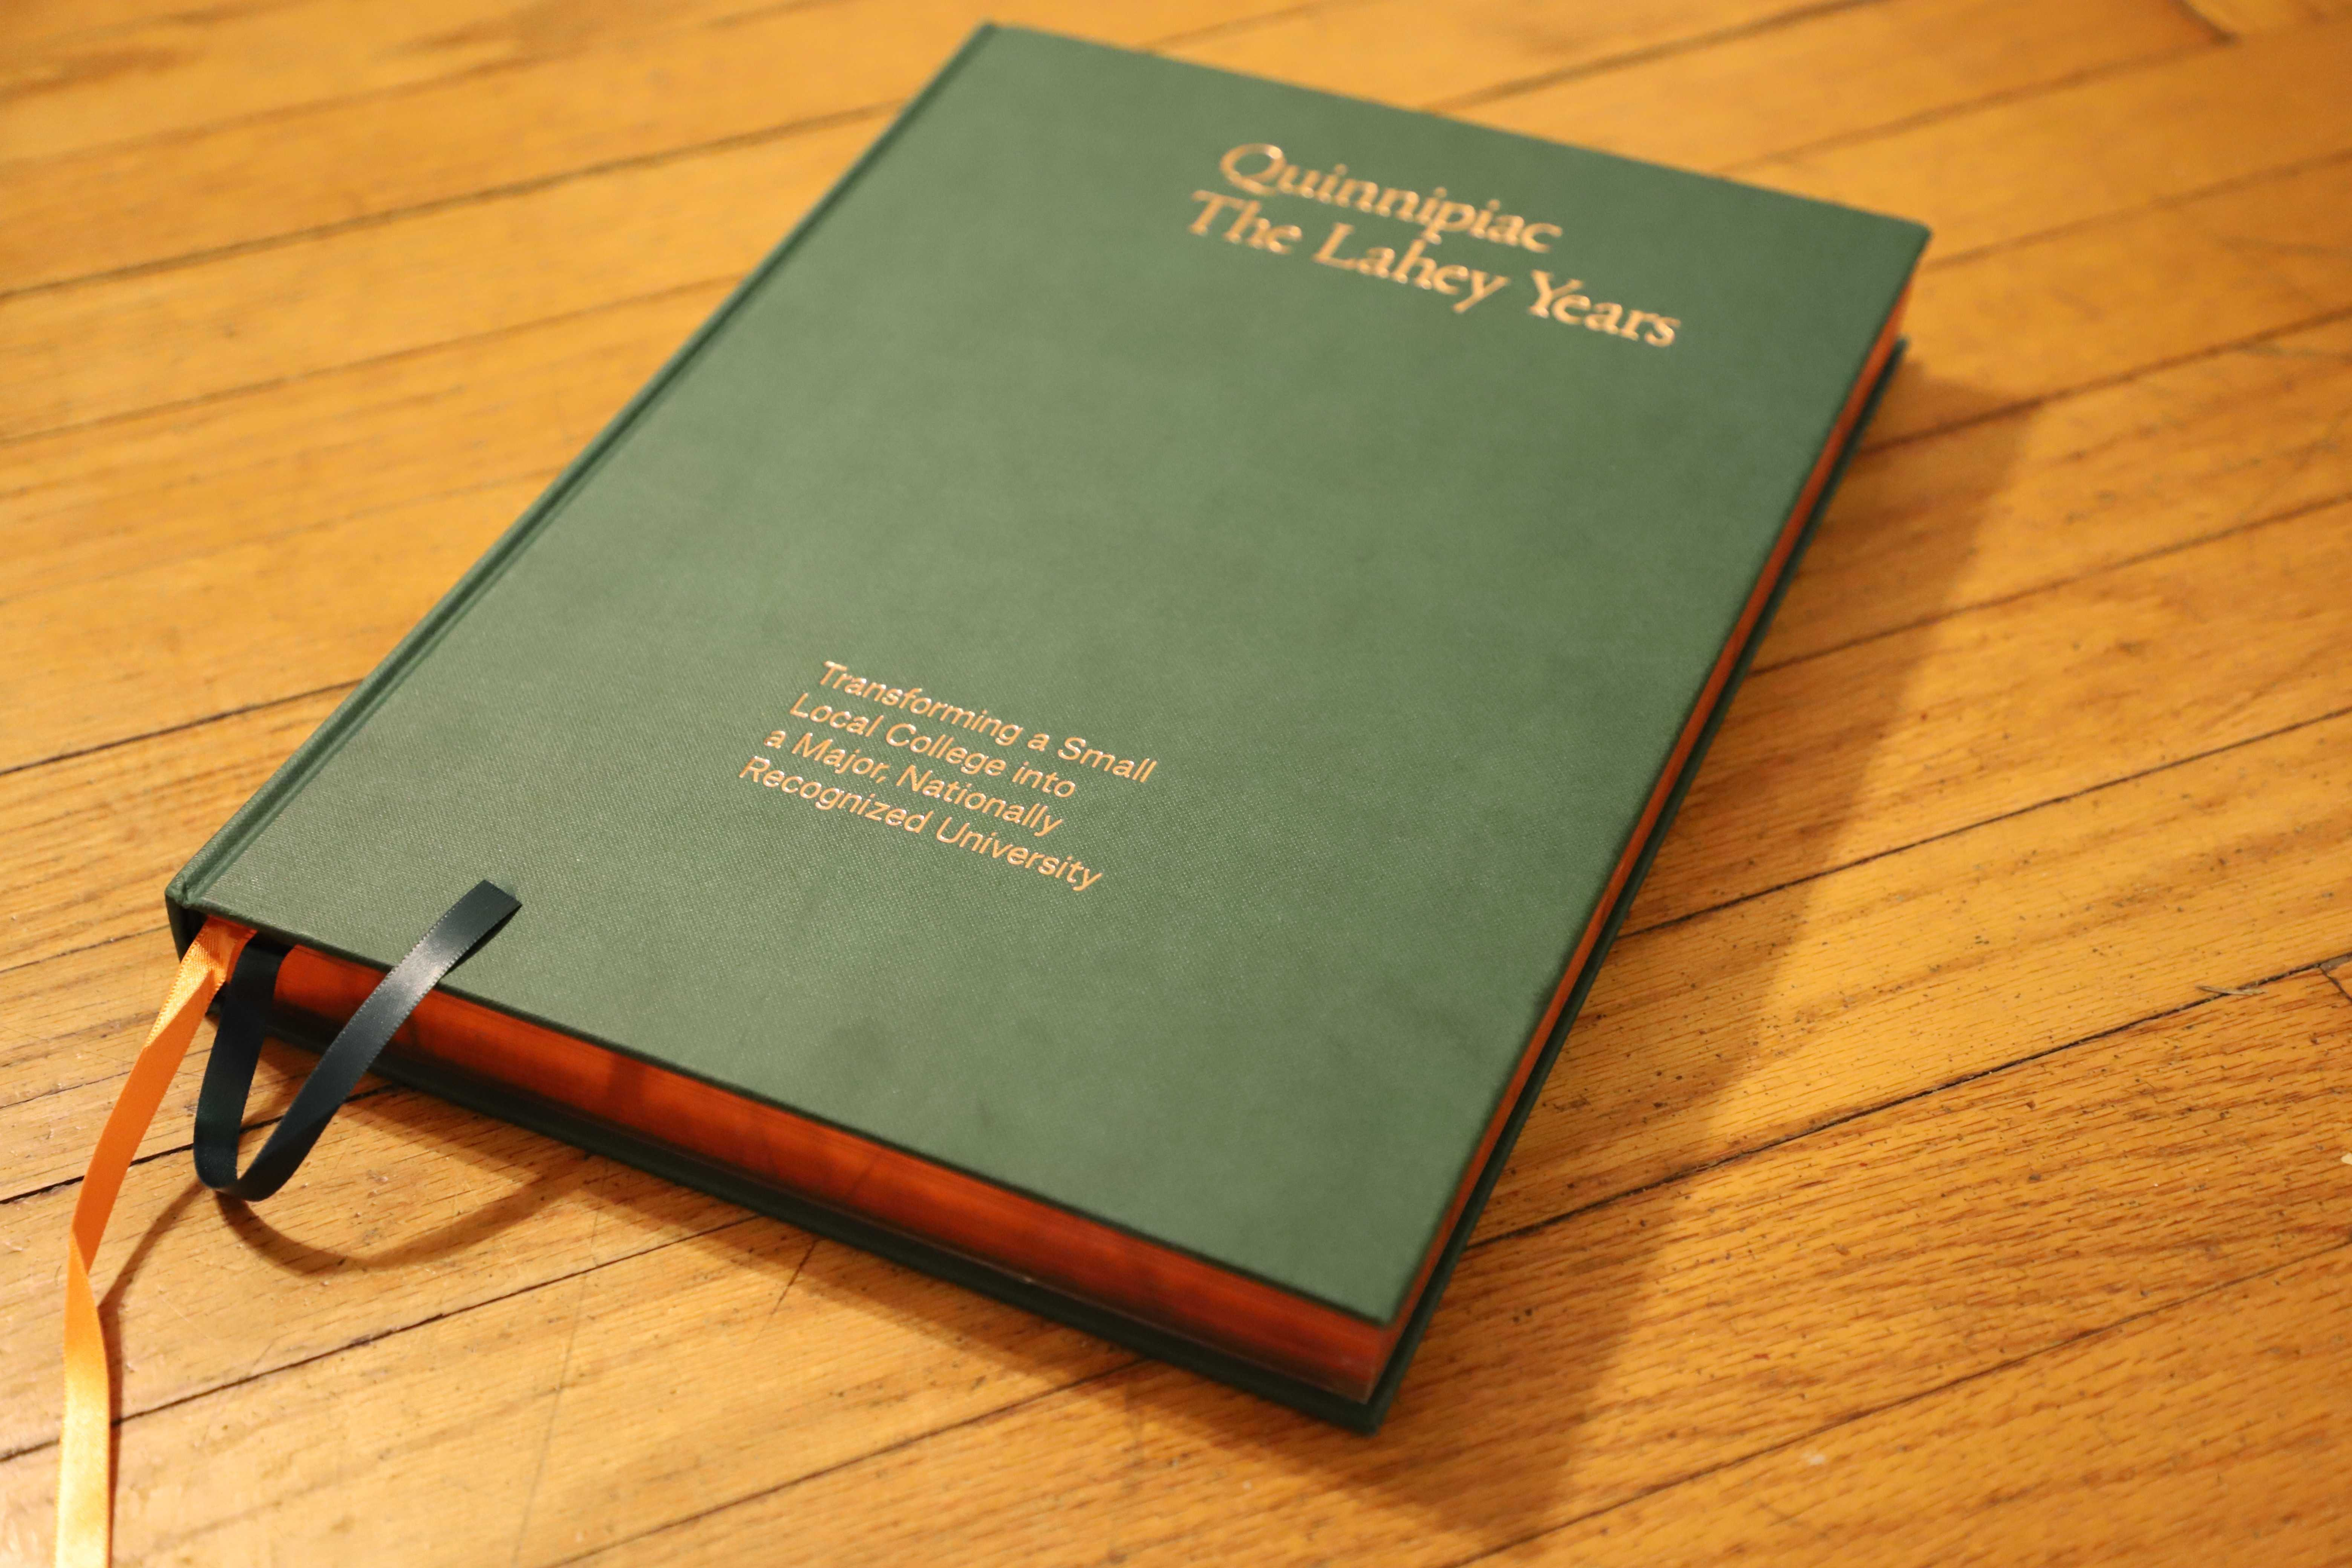 Lahey's lasting legacy